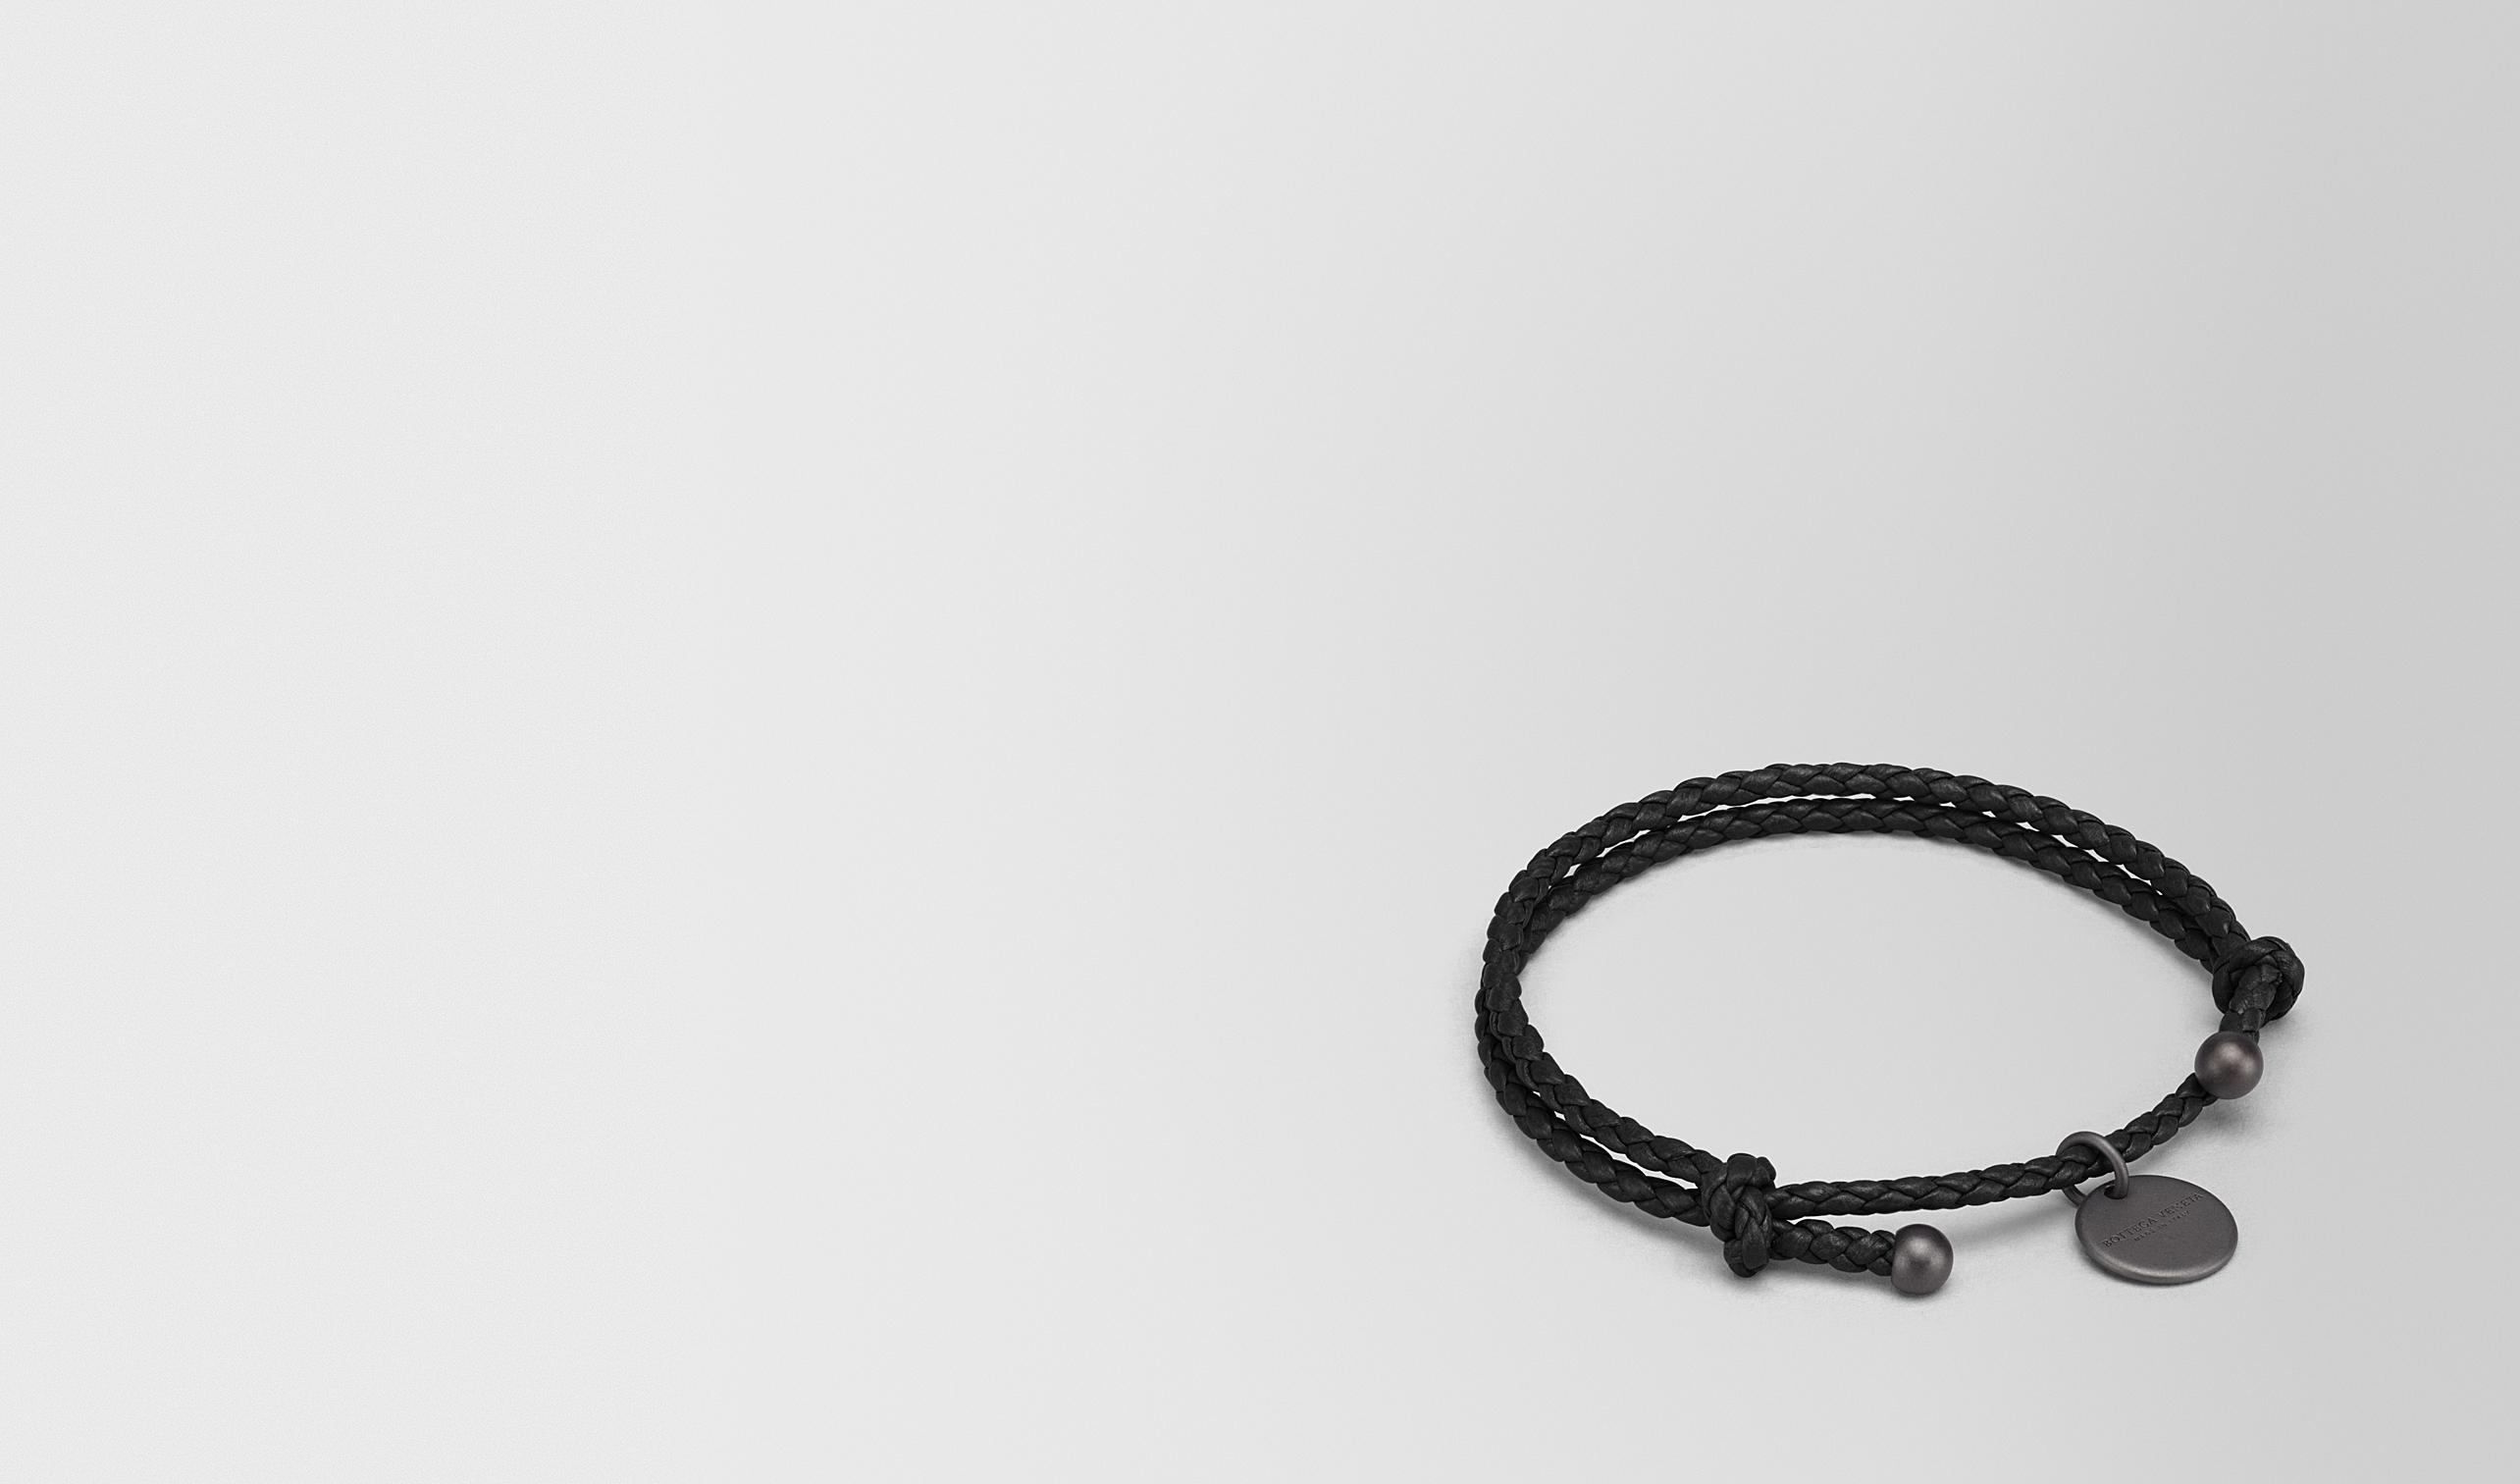 BOTTEGA VENETA Schlüsselring oder Armband E ARMBAND AUS INTRECCIATO NAPPA IN NERO pl